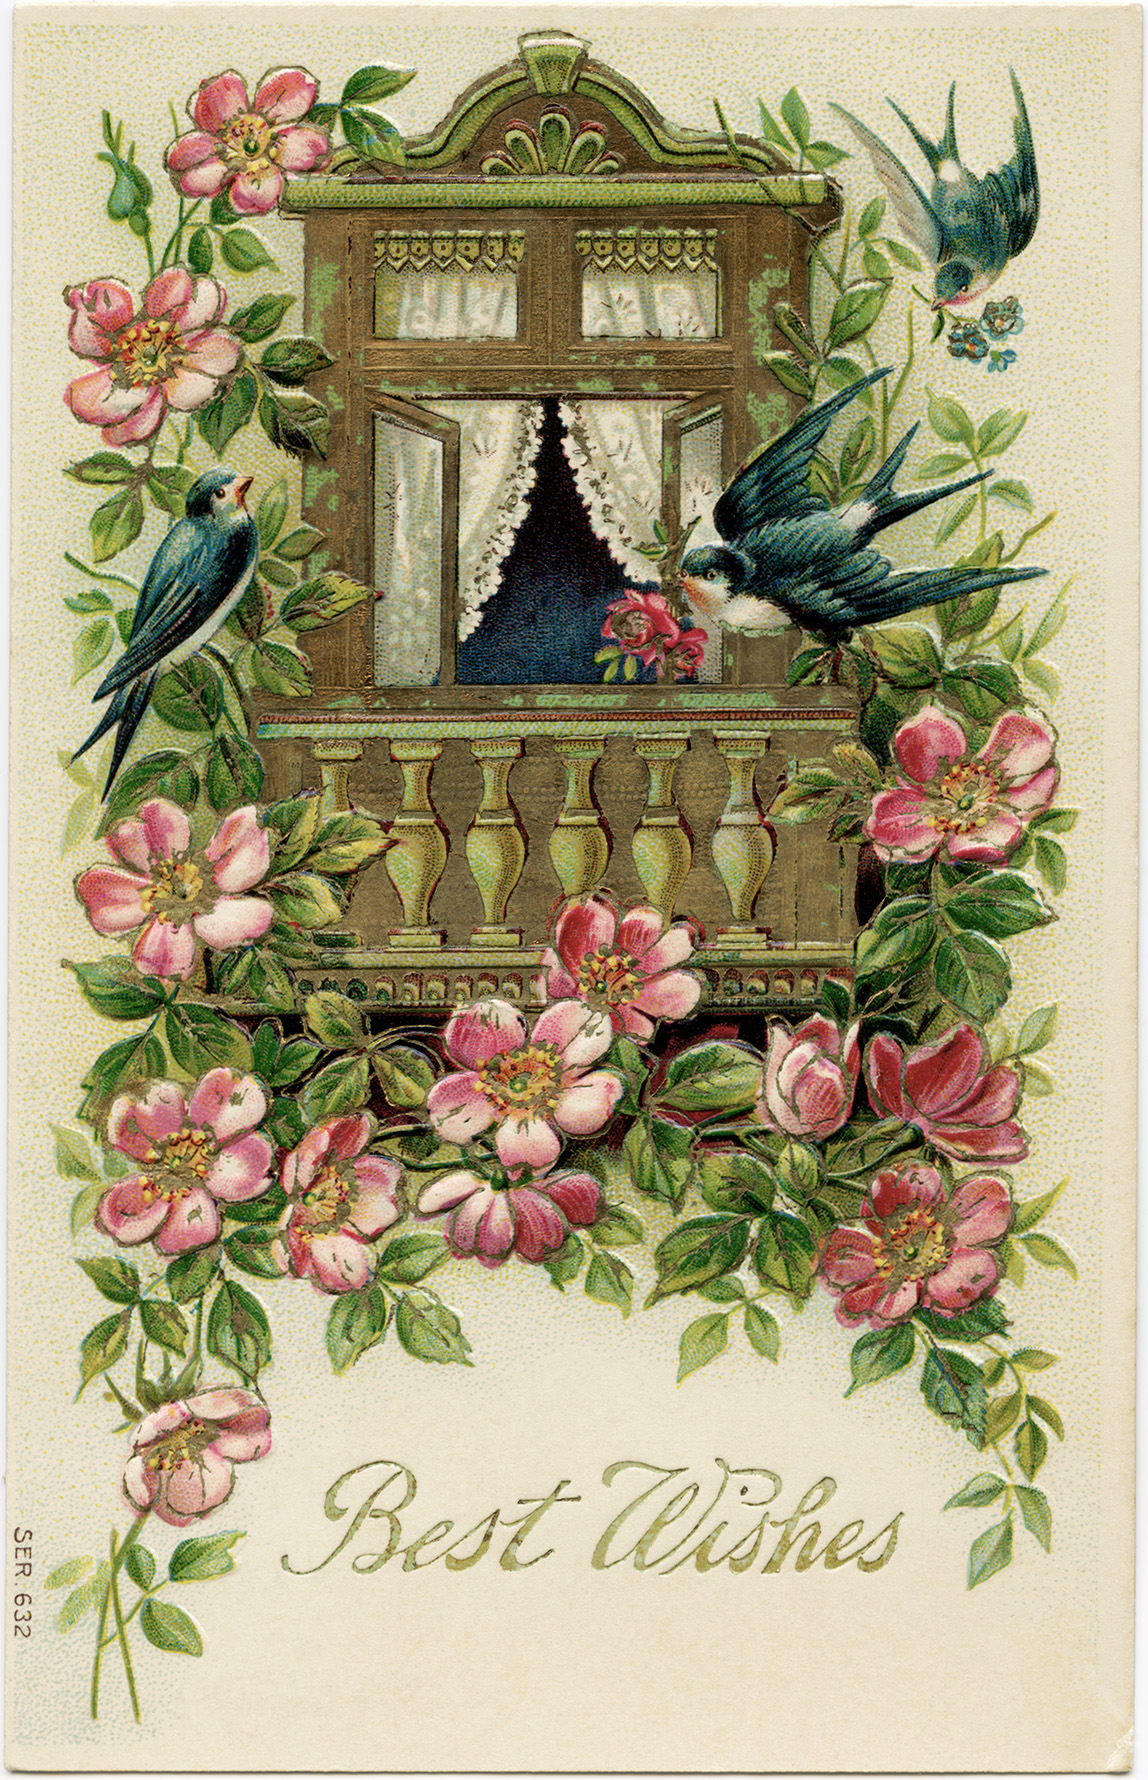 Birds And Flowers Postcard Free Vintage Image